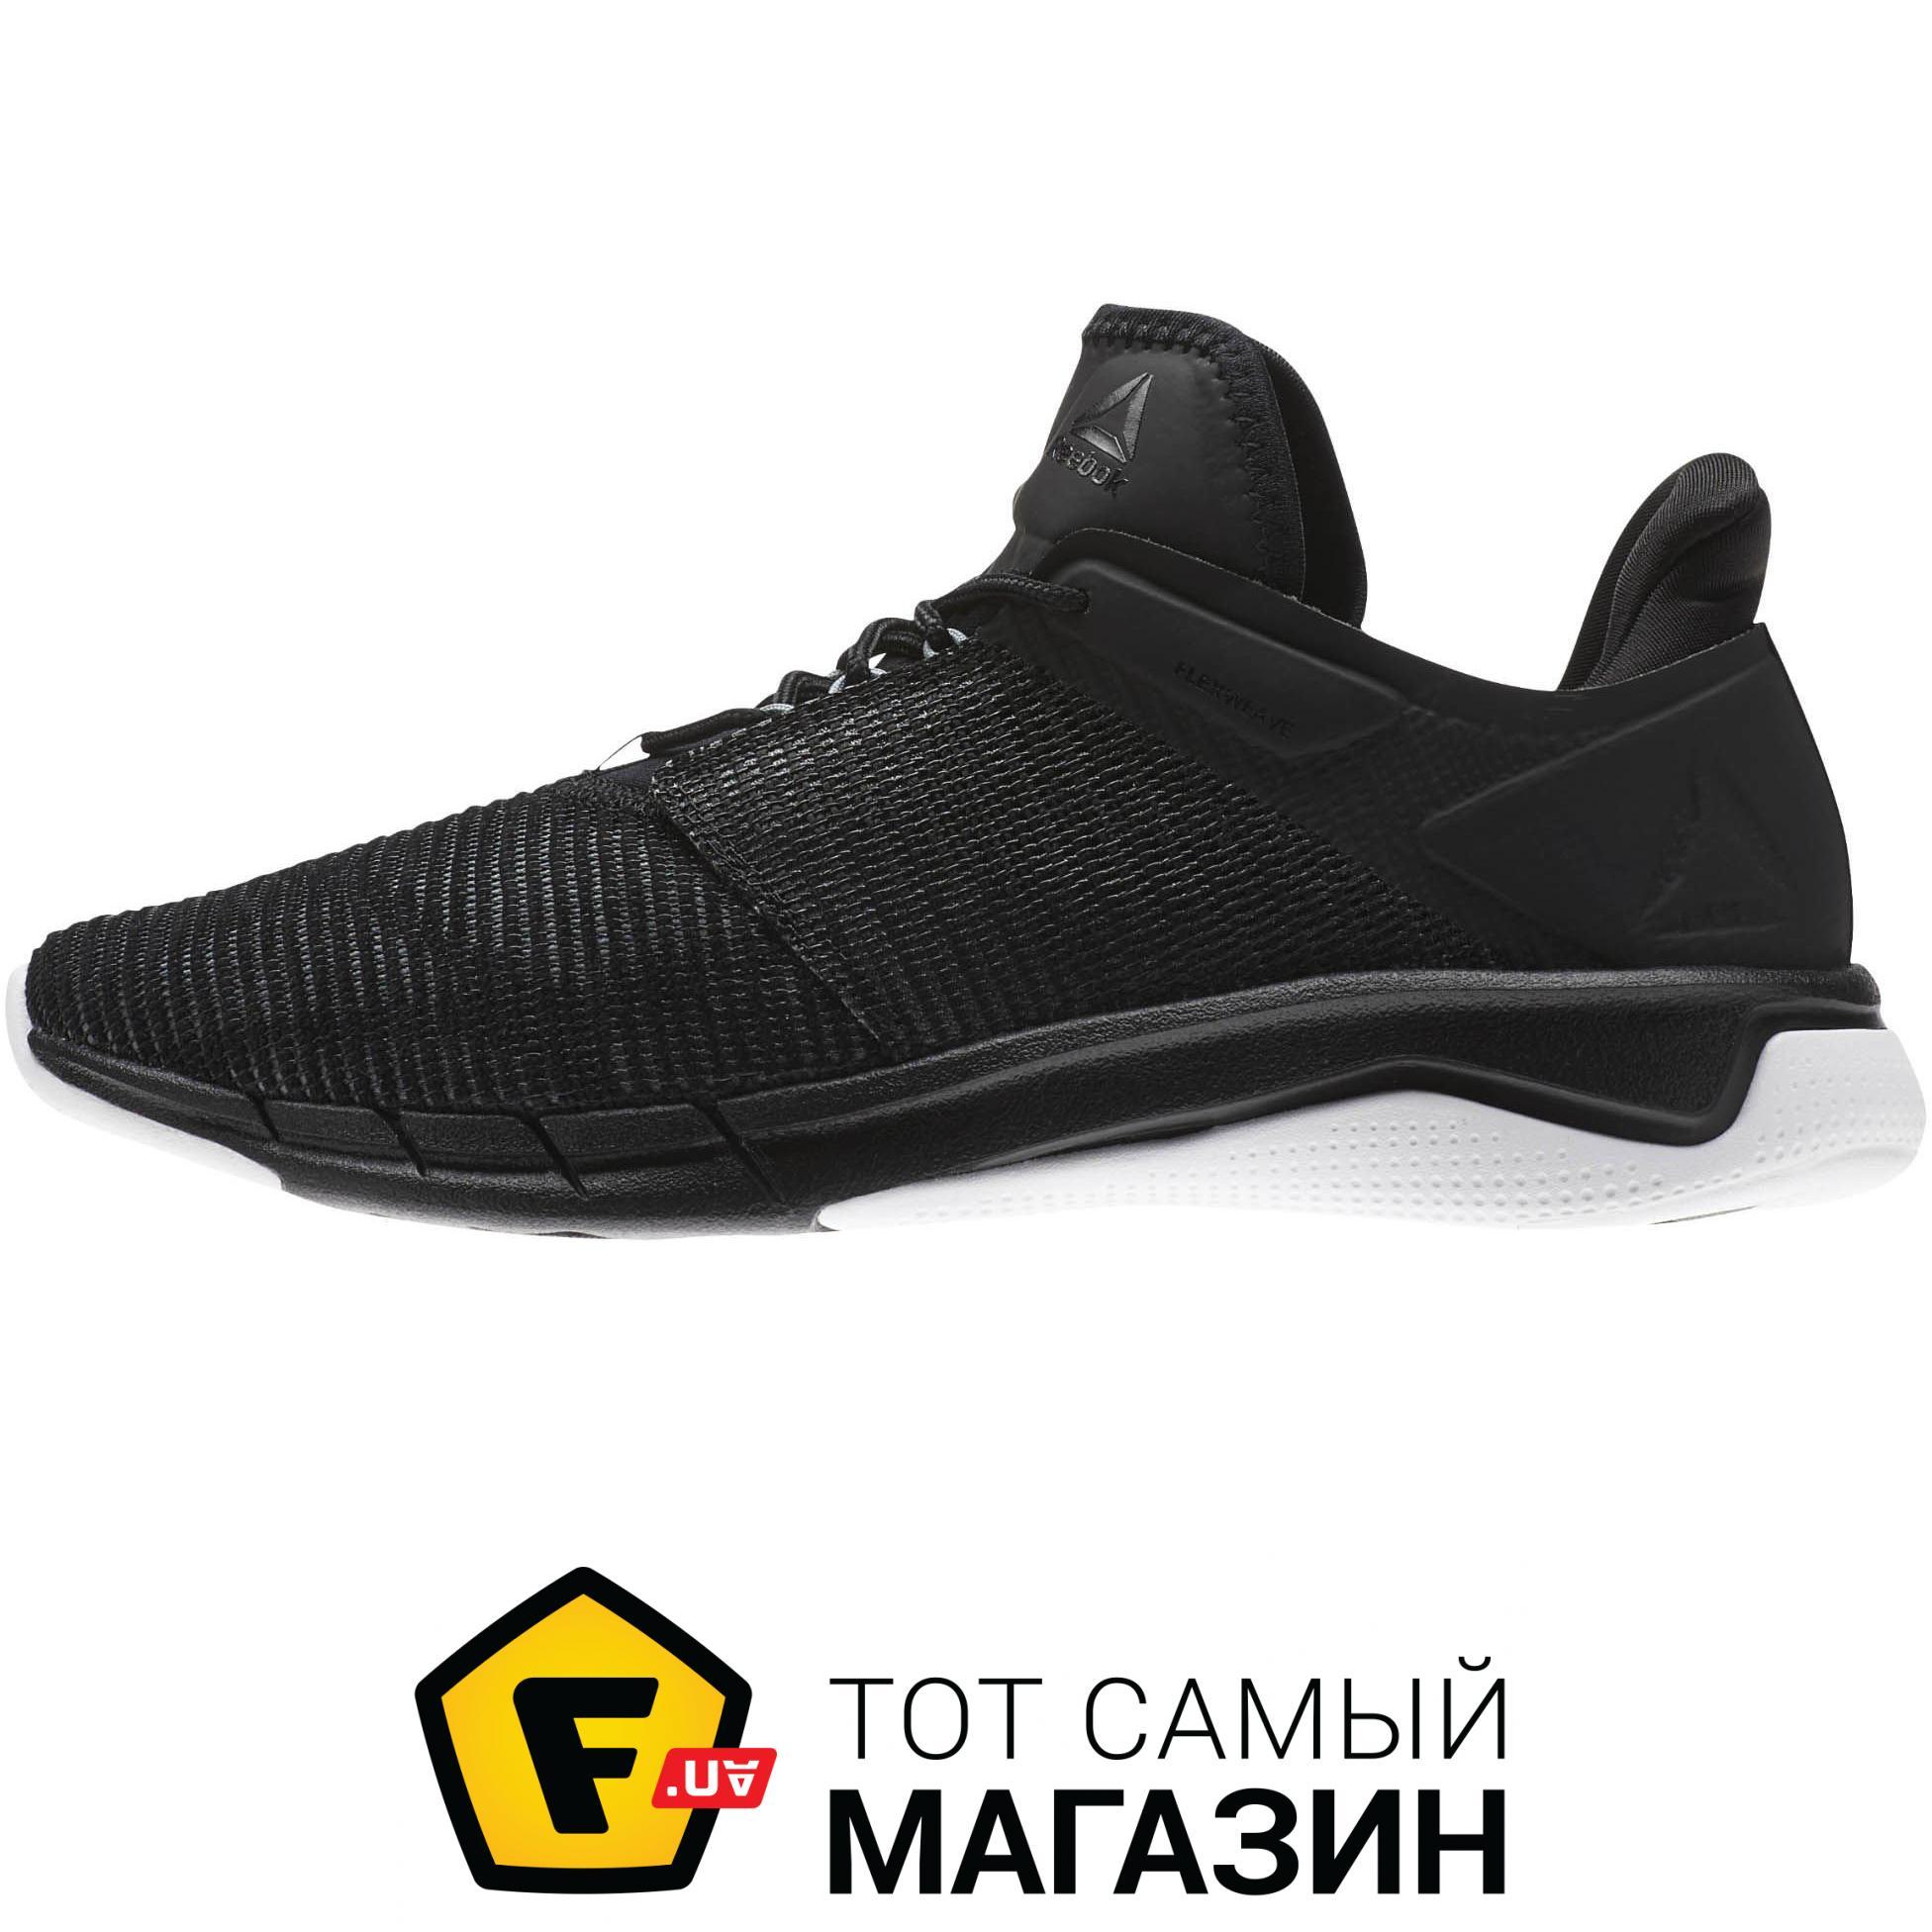 67c108abae1589 ... Кроссовки Reebok Fast Flexweave™ женские Black / Coal / Flint Grey /  White, 8.5 ...